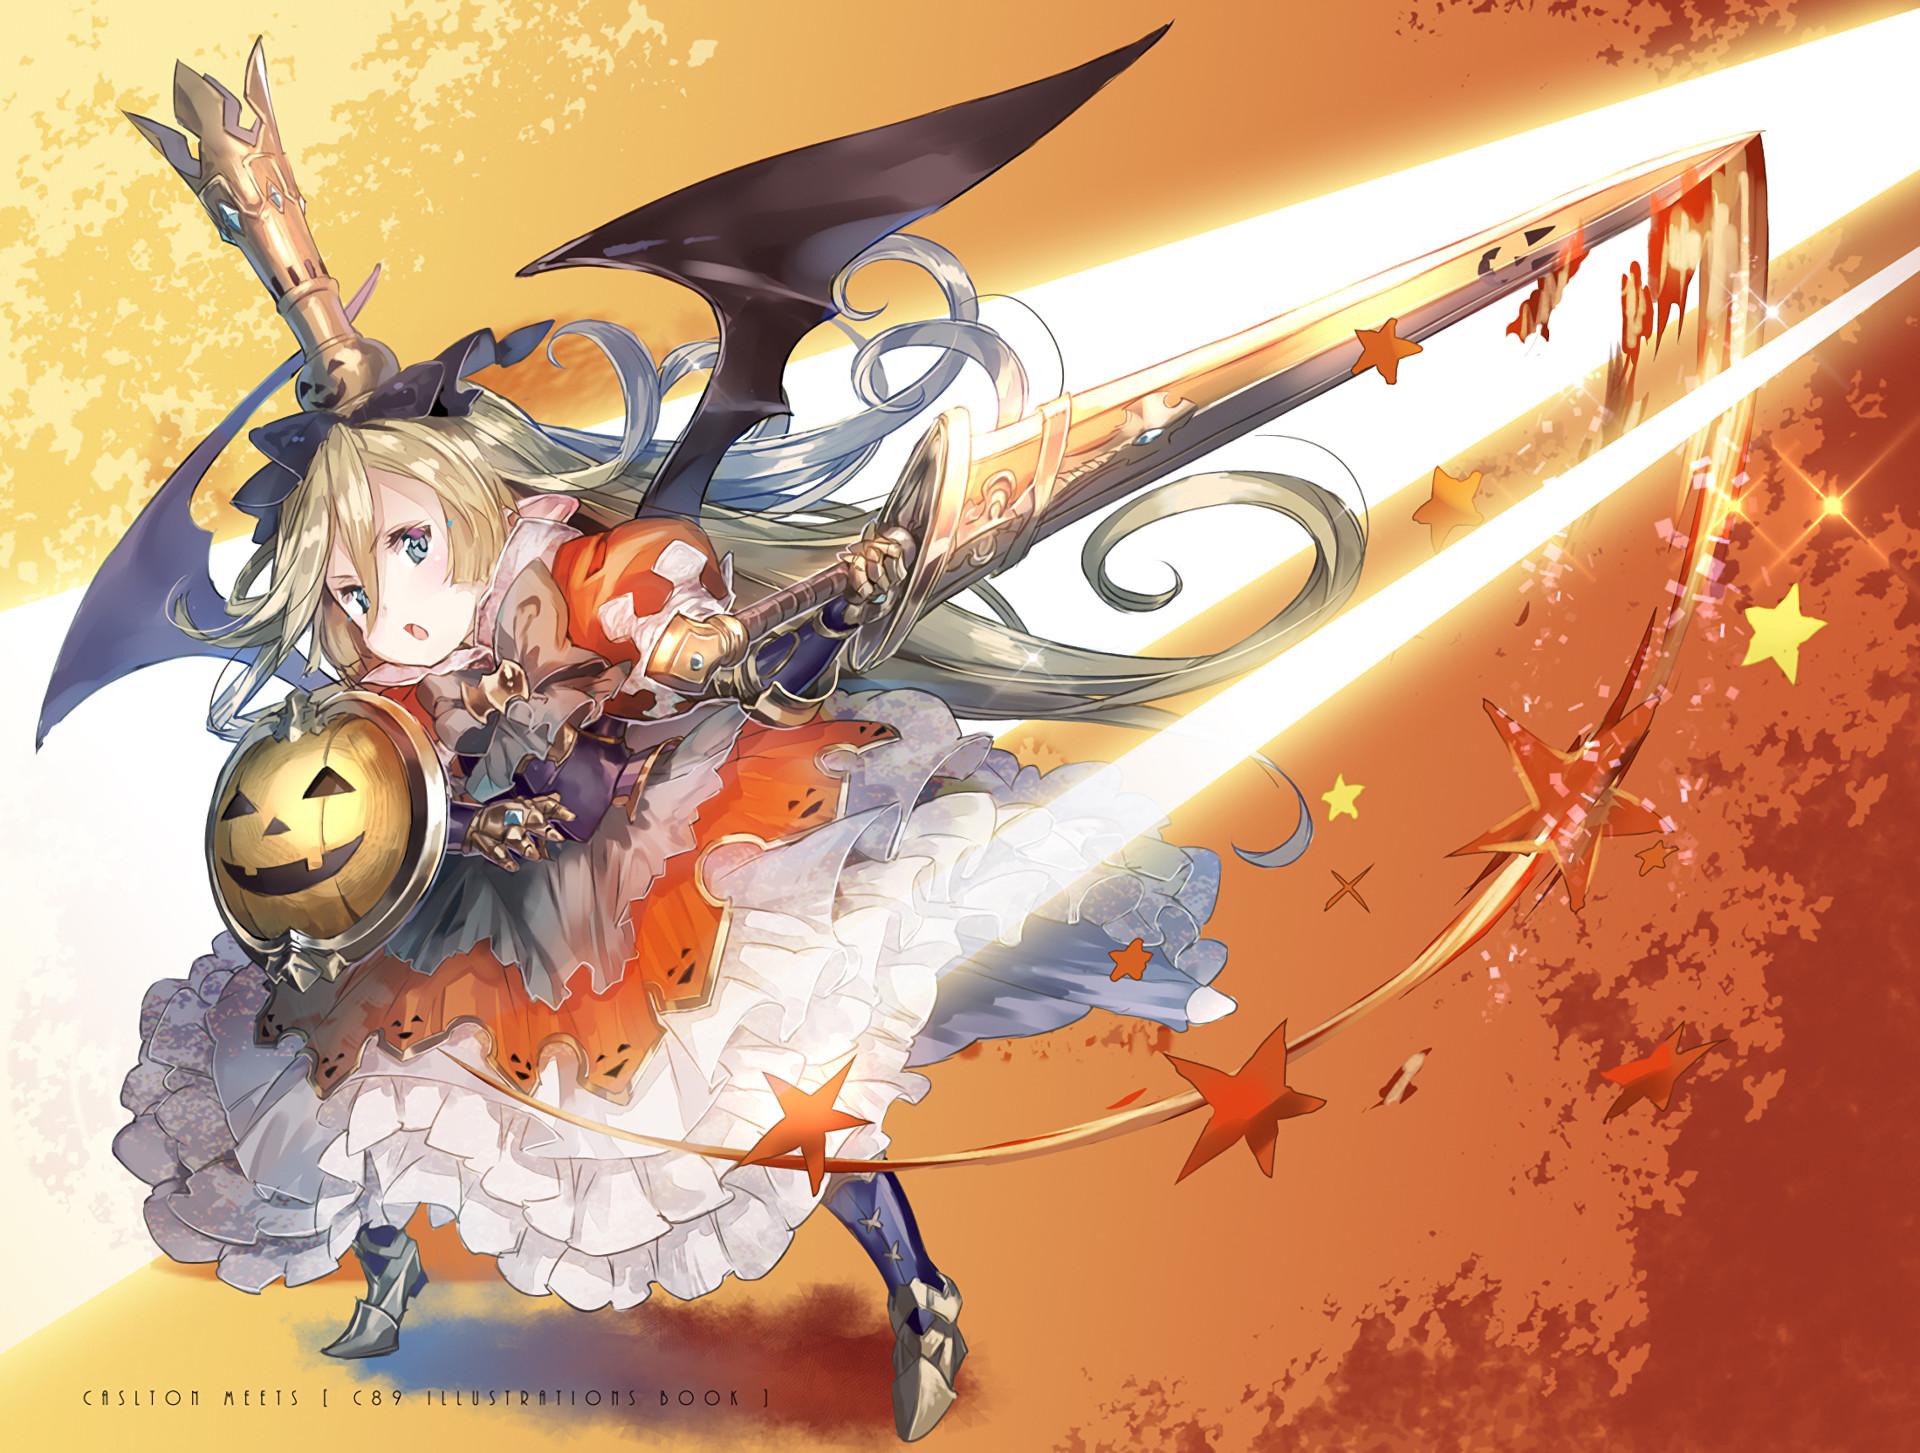 Anime Granblue Fantasy Charlotta (Granblue Fantasy) Halloween Wallpaper